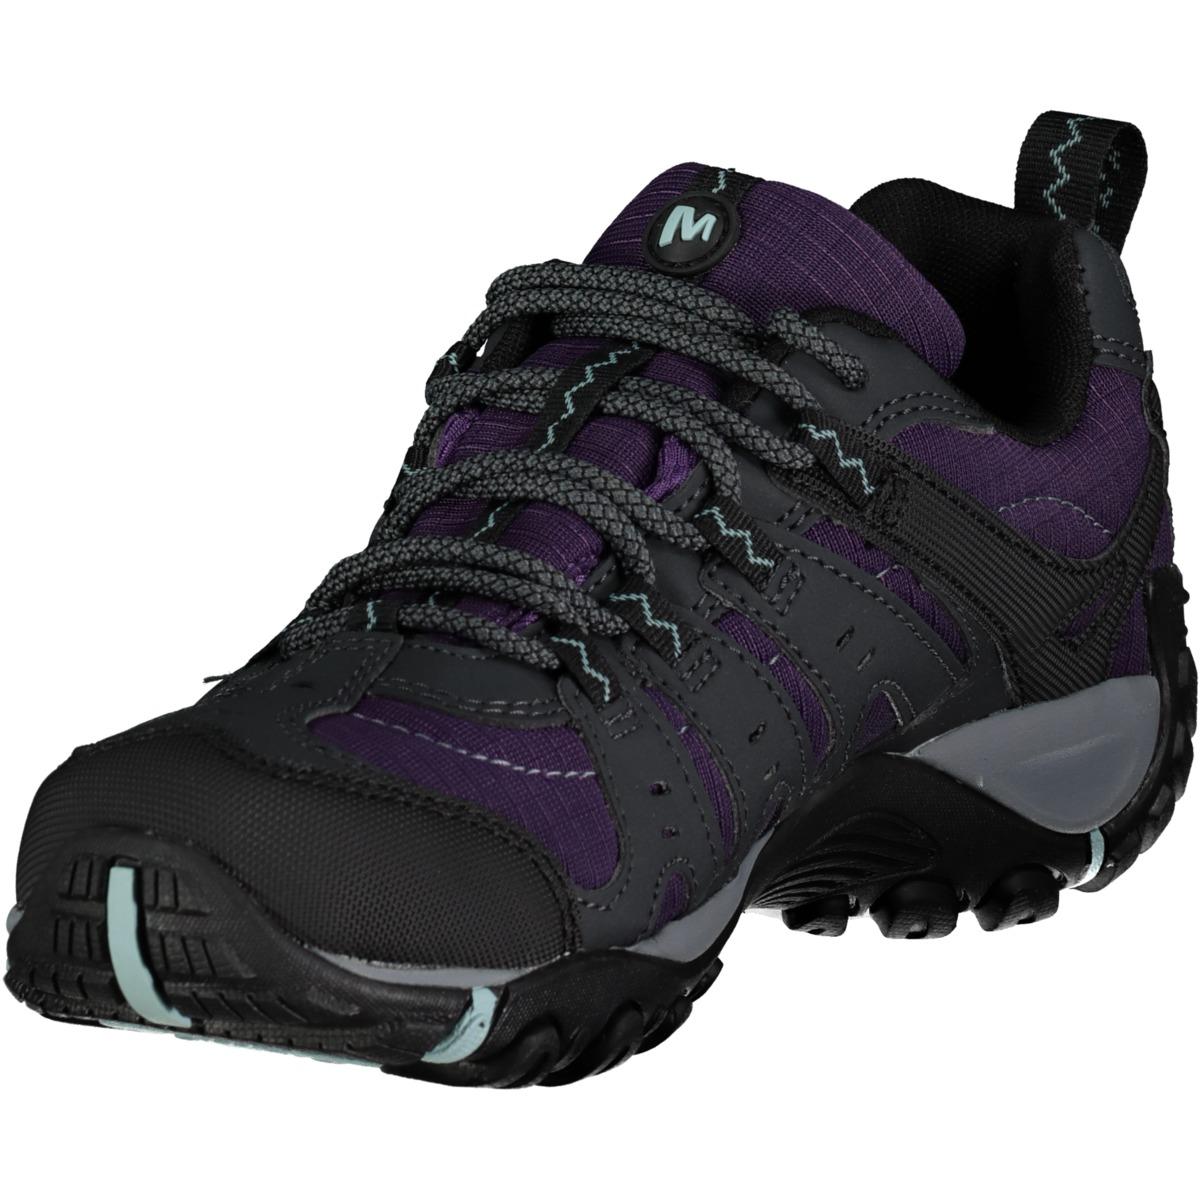 Accentor sport GTX, hikingsko dame